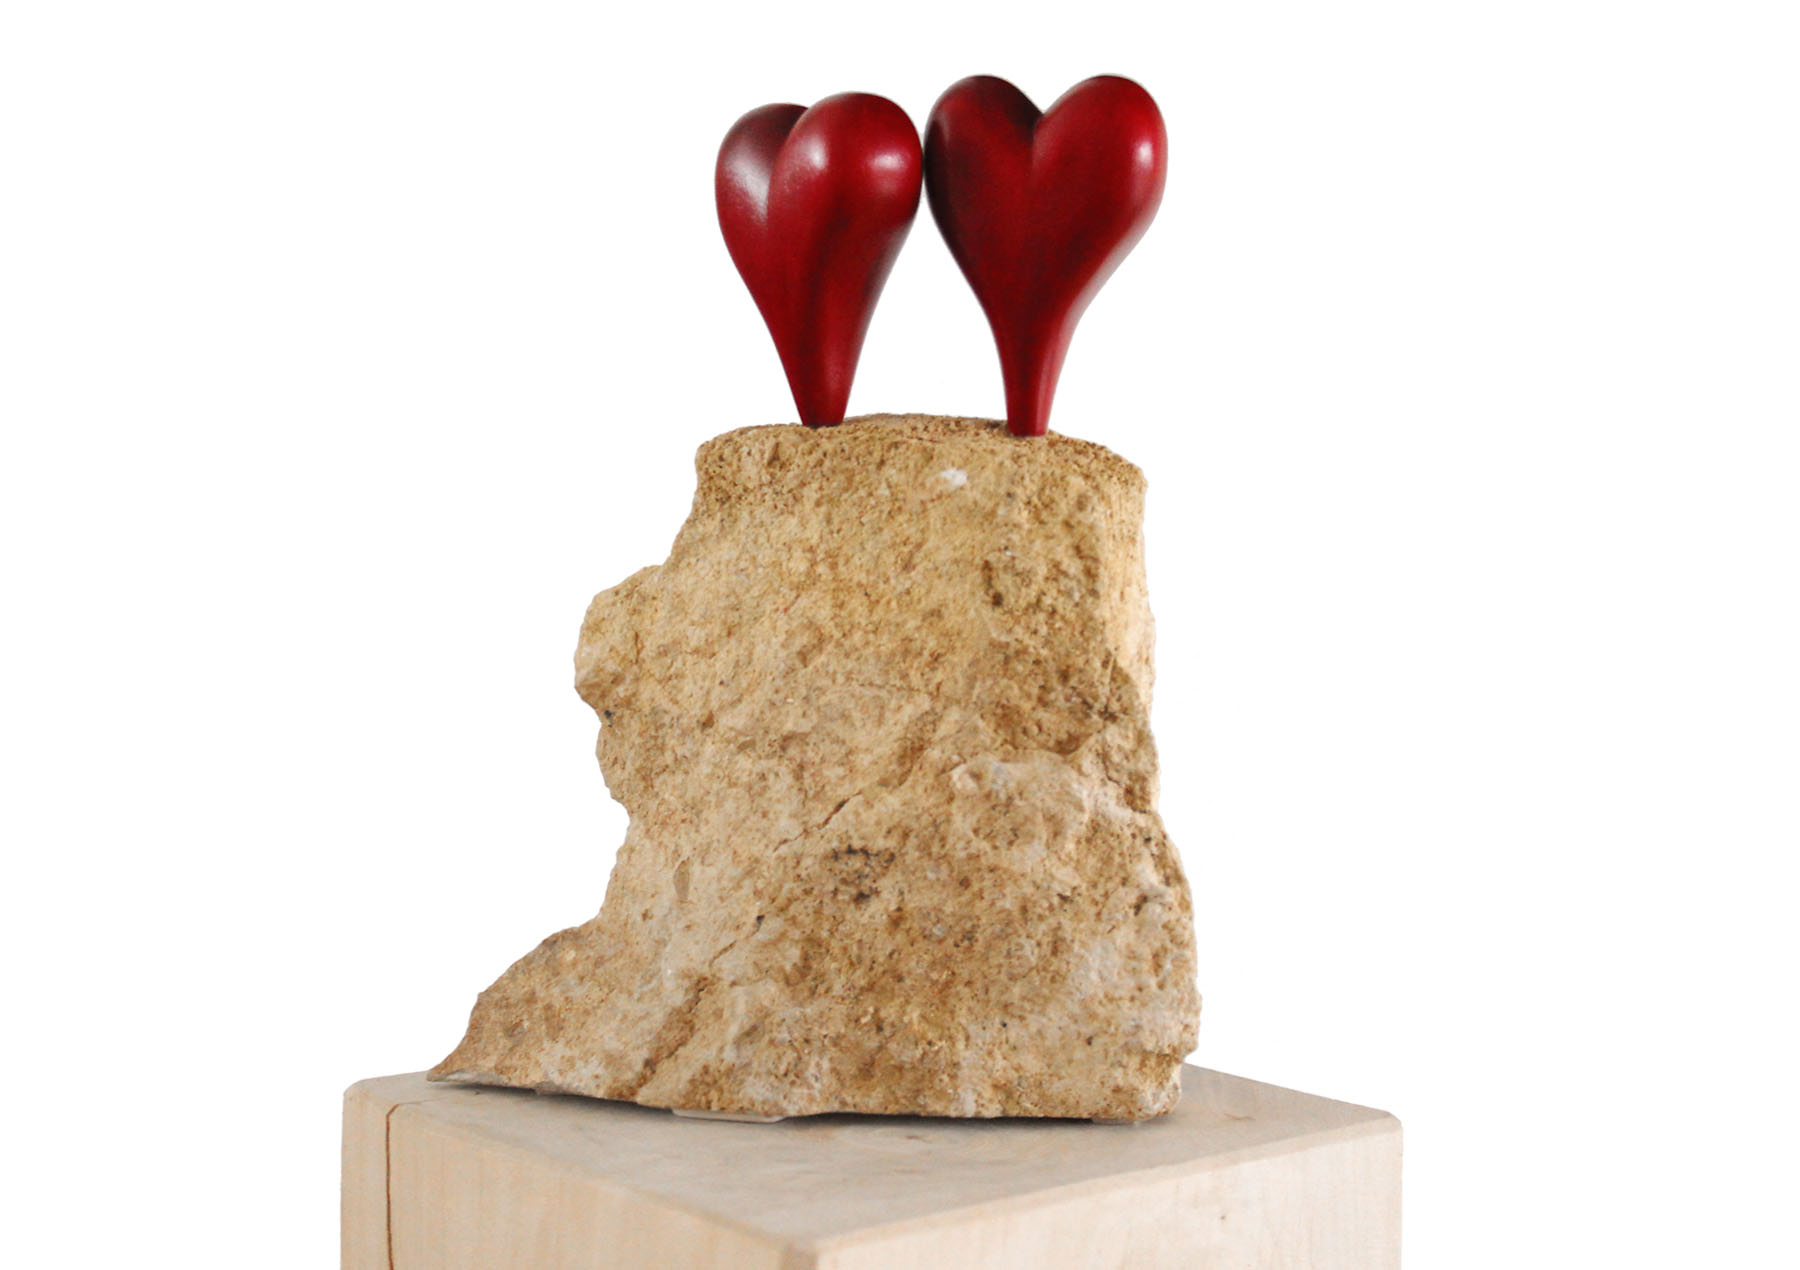 moderne skulpturen von jo zipfel online kaufen kunstgalerie eventart die kunstmacher. Black Bedroom Furniture Sets. Home Design Ideas